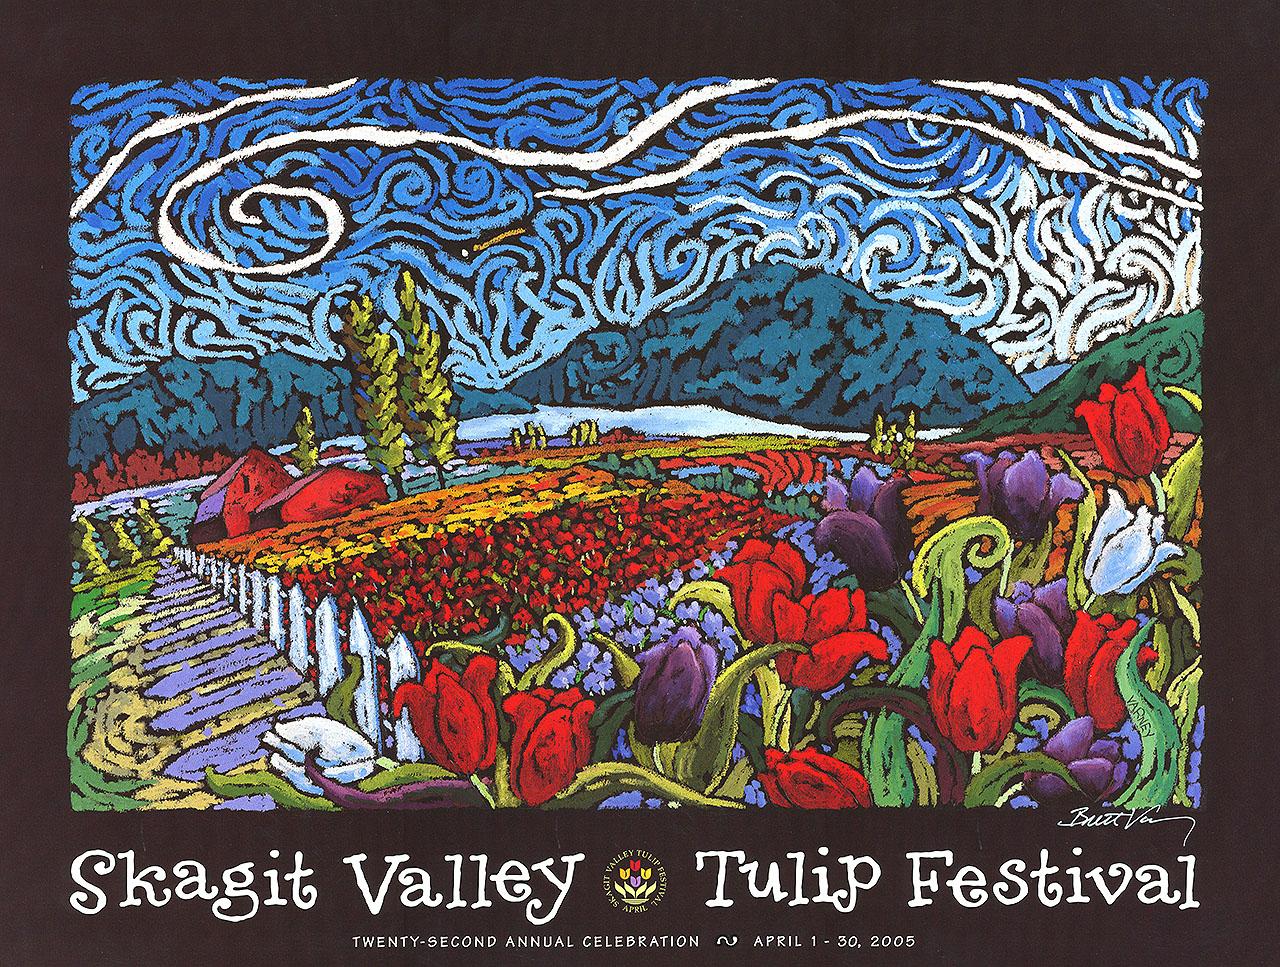 Tulip Festival Poster 2005